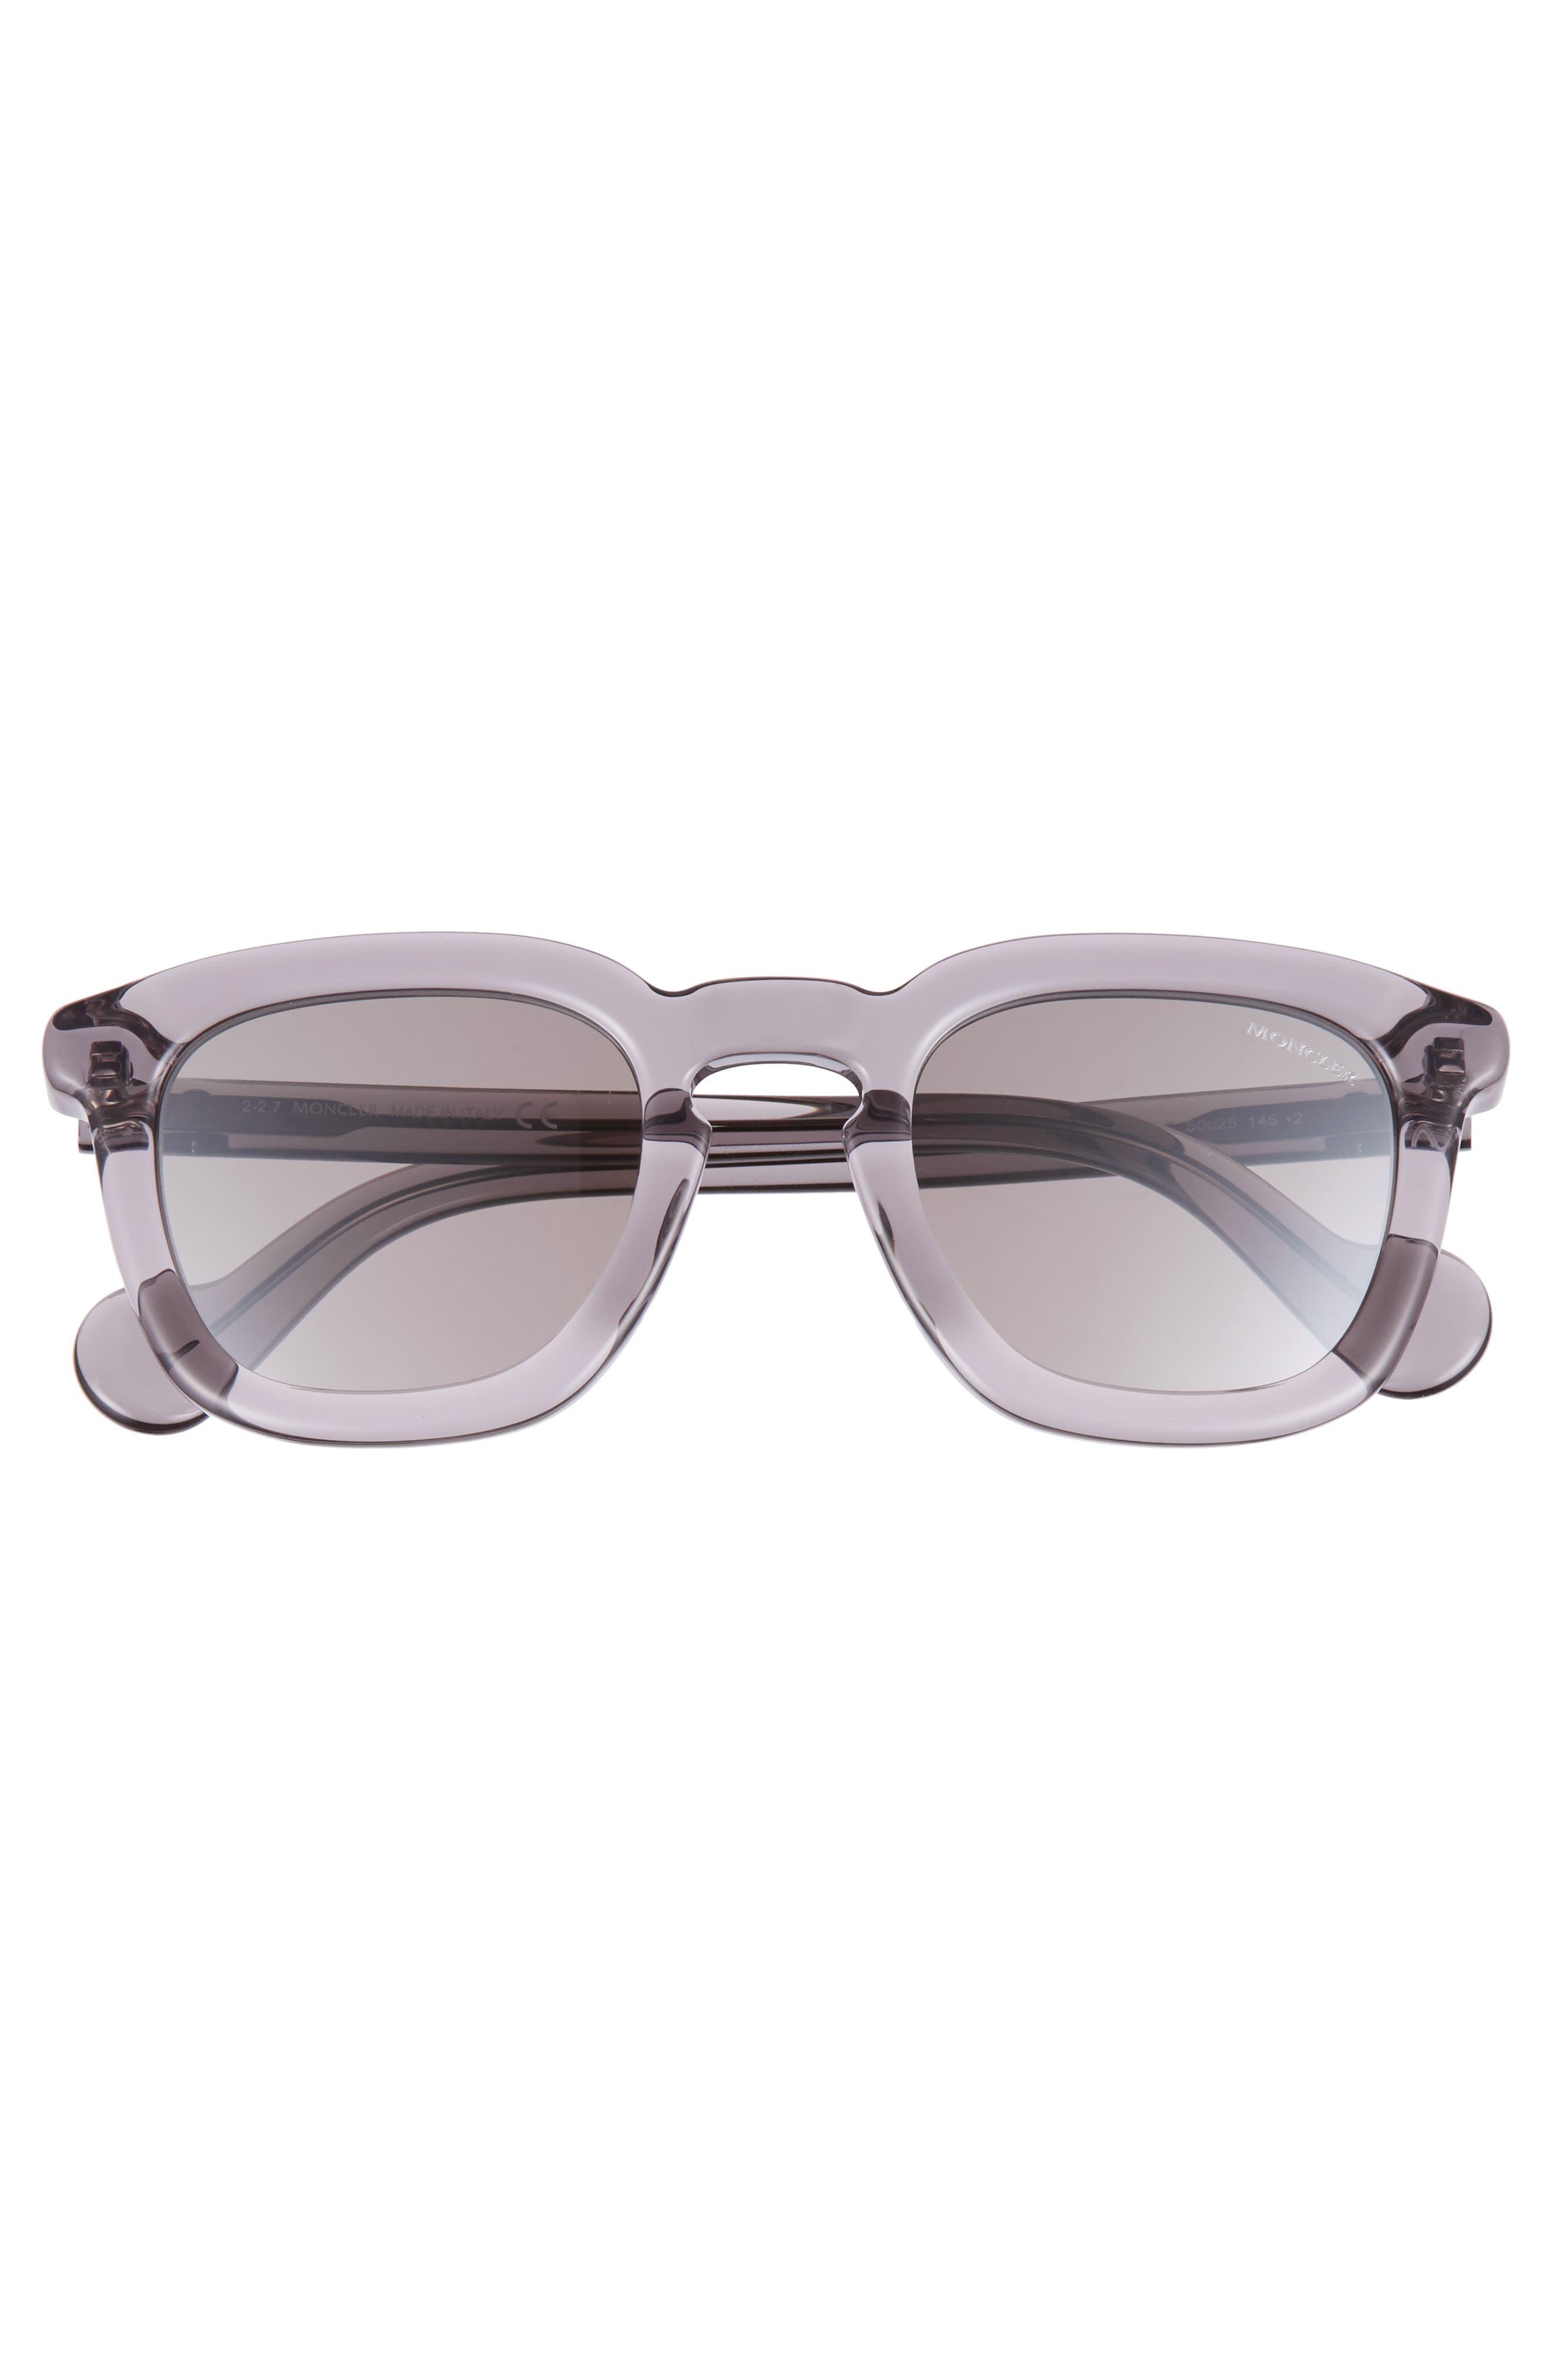 50mm Square Sunglasses,                             Alternate thumbnail 5, color,